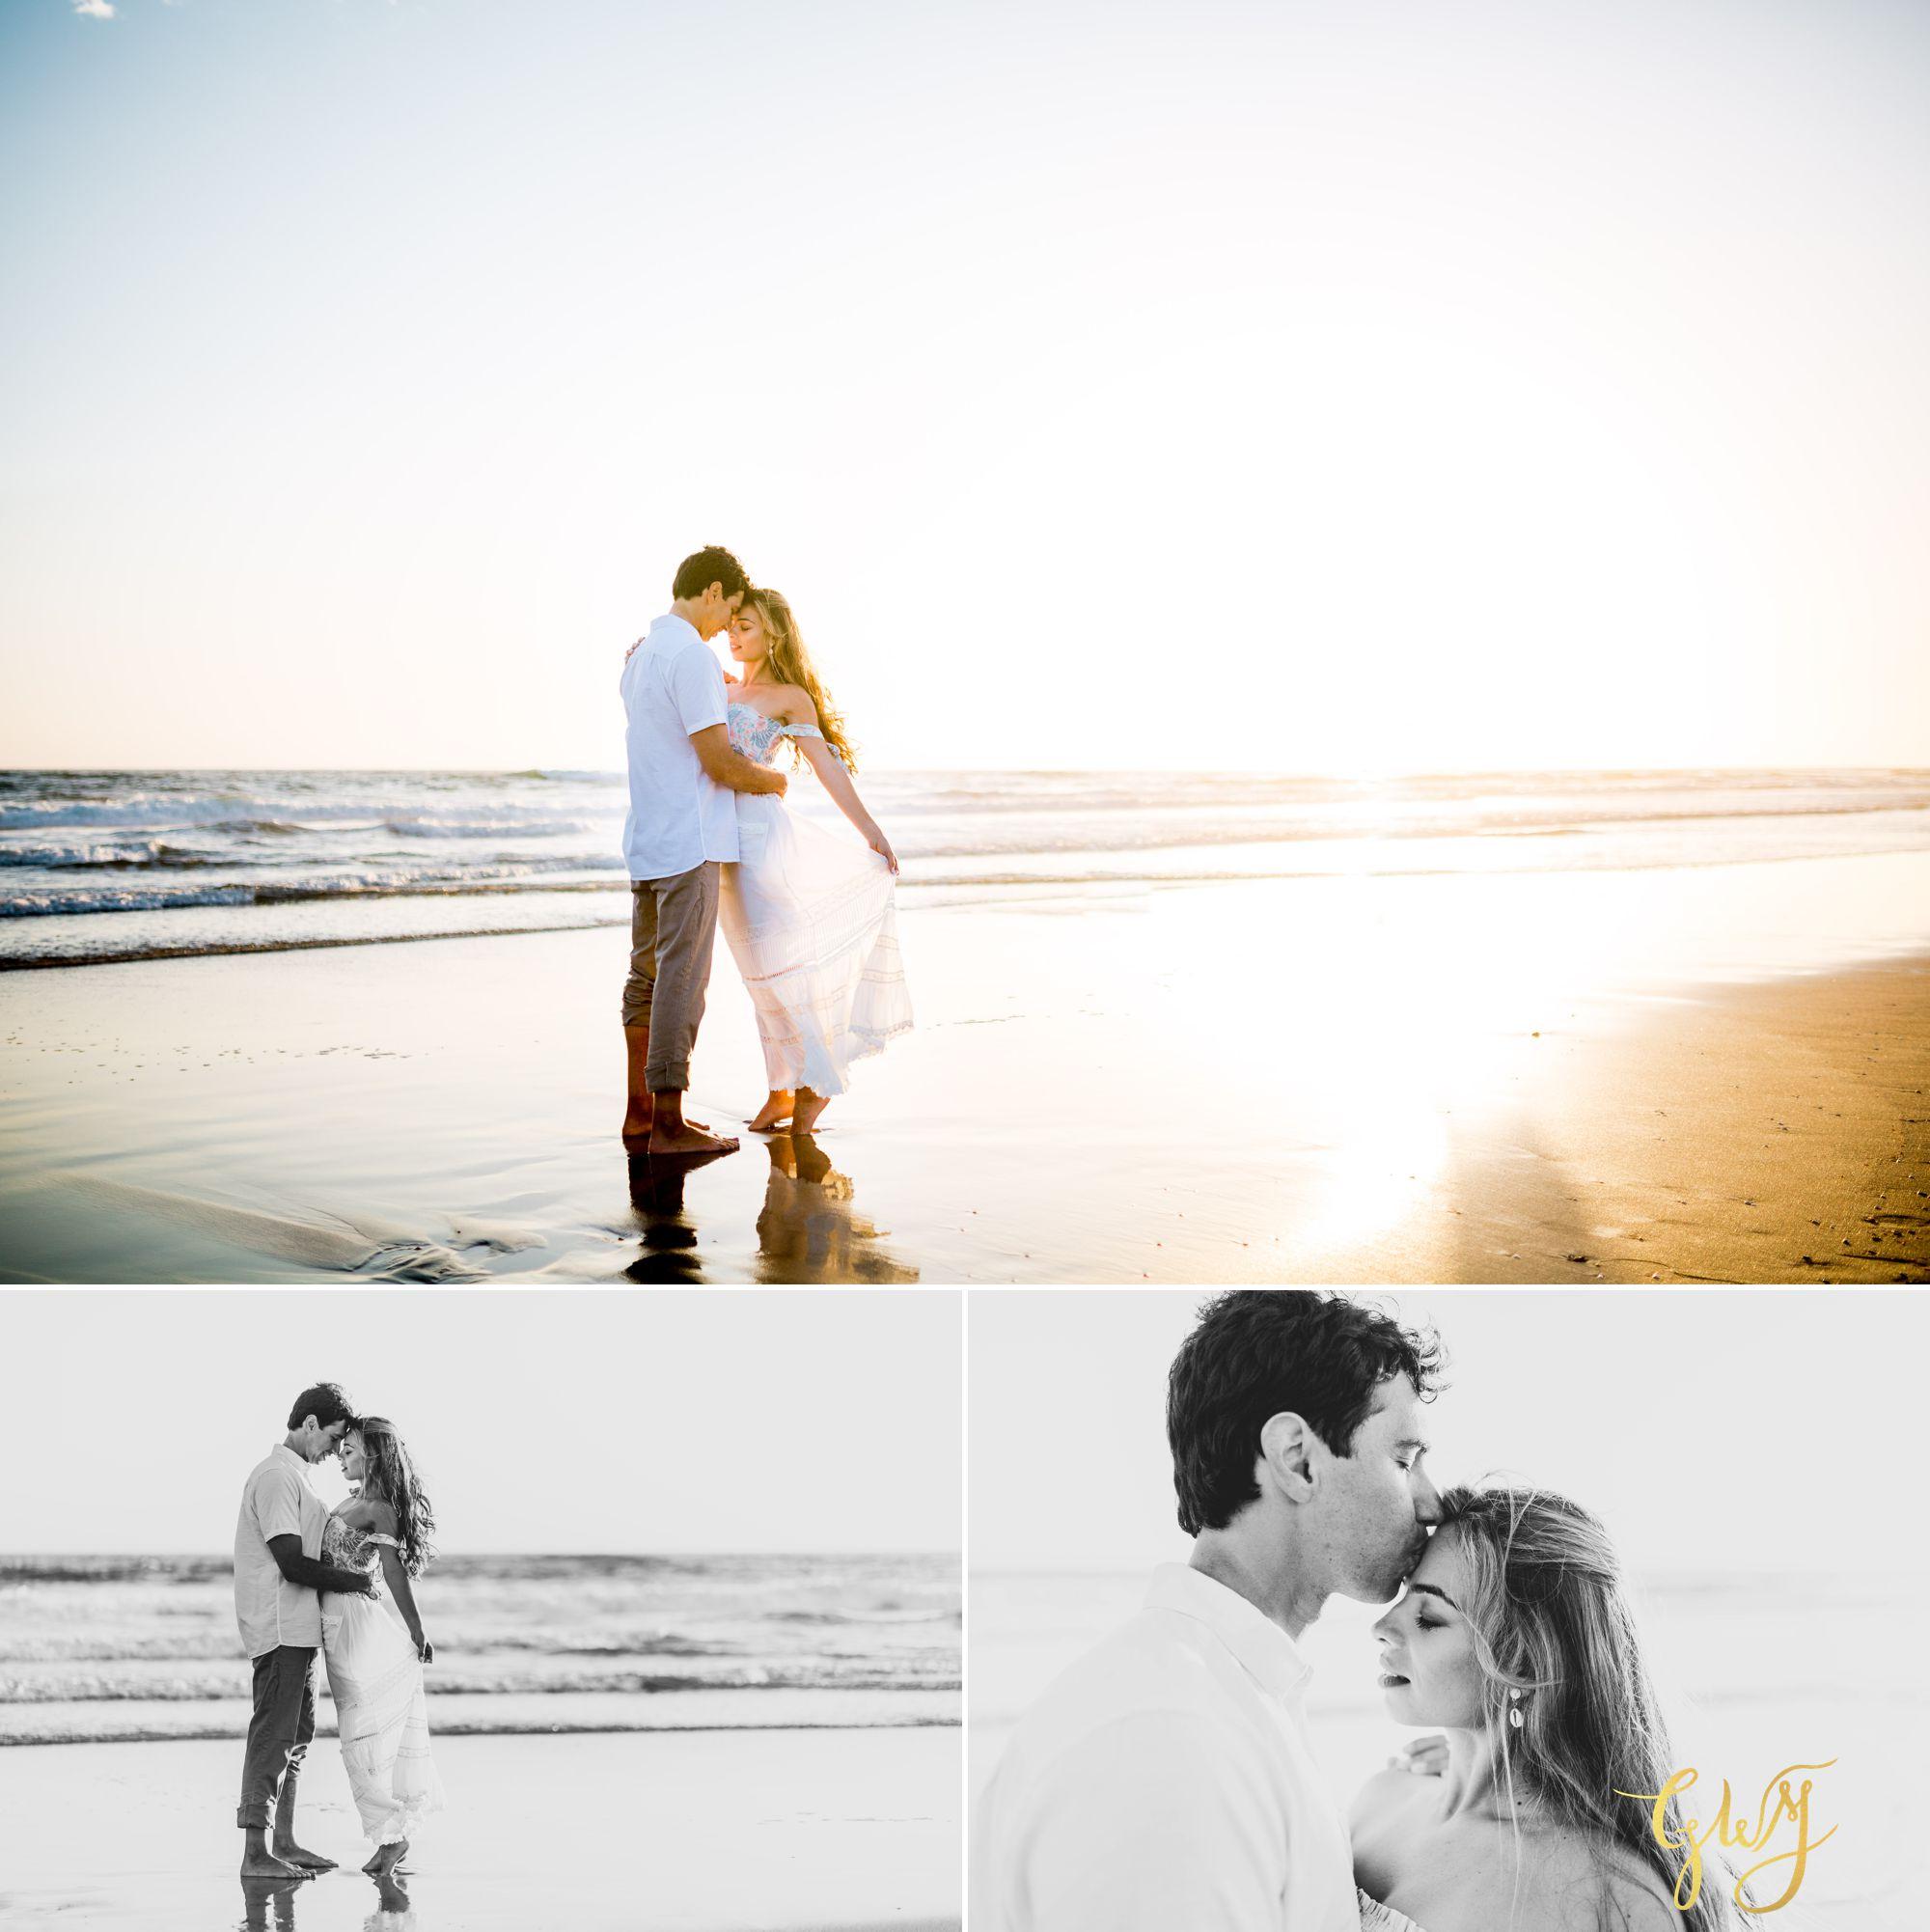 Felipe + Isabella Huntington Beach Summer Sunset Engagement Session by Glass Woods Media 22.jpg